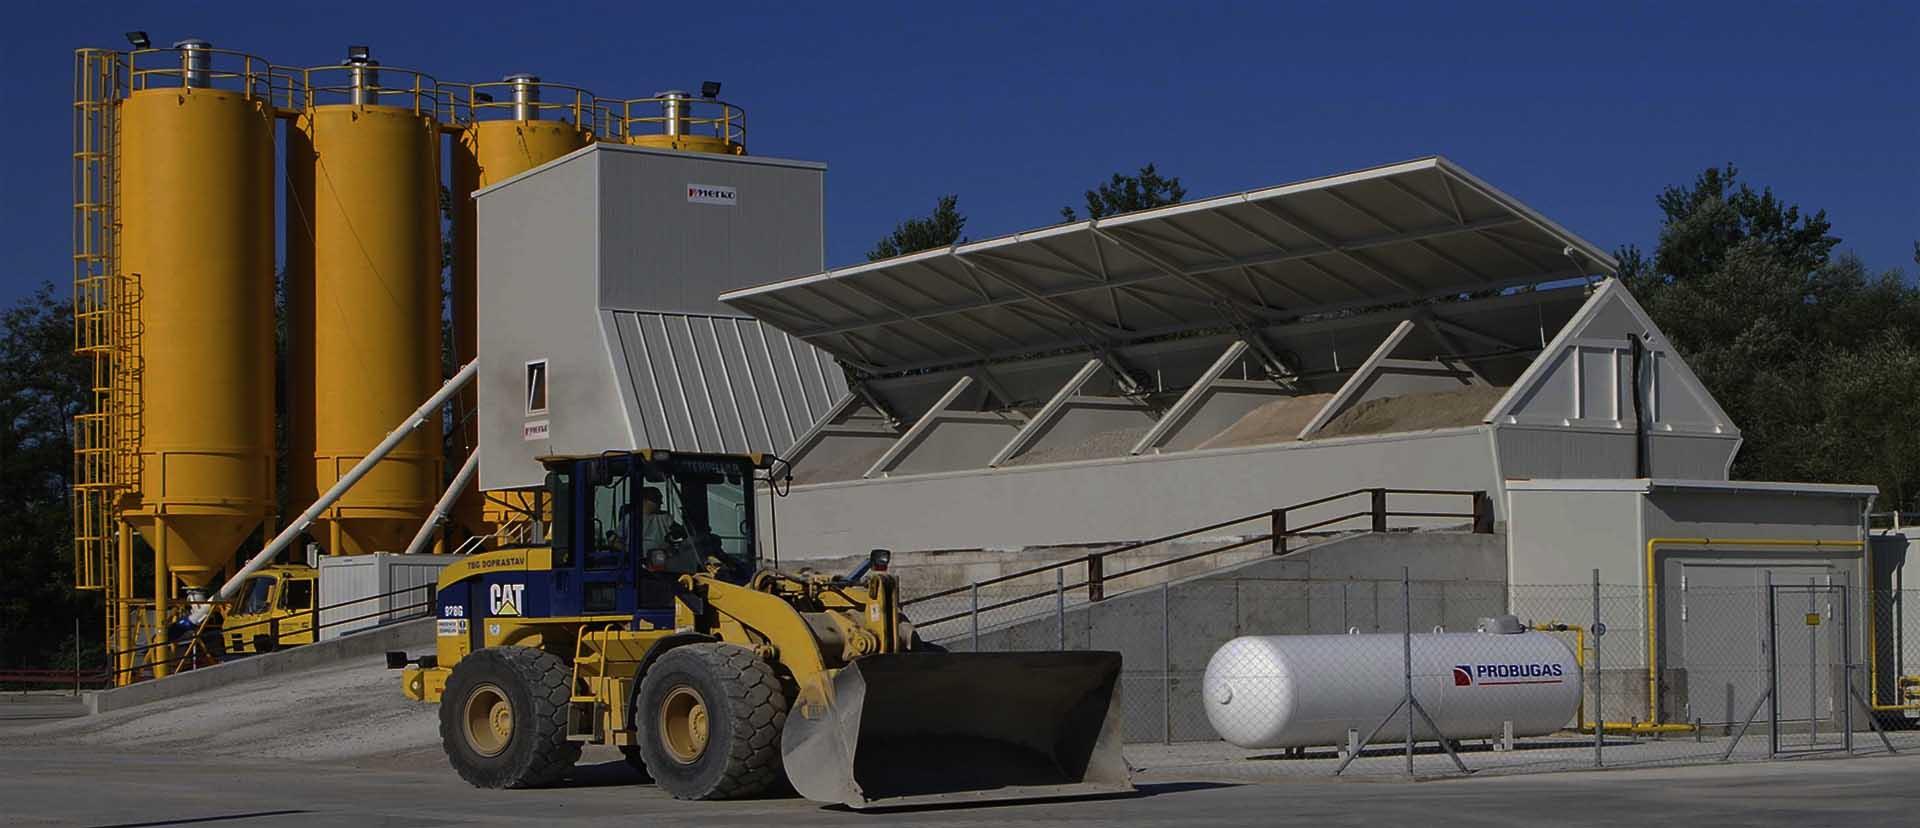 Завод бетон кингисепп бетон в татарске